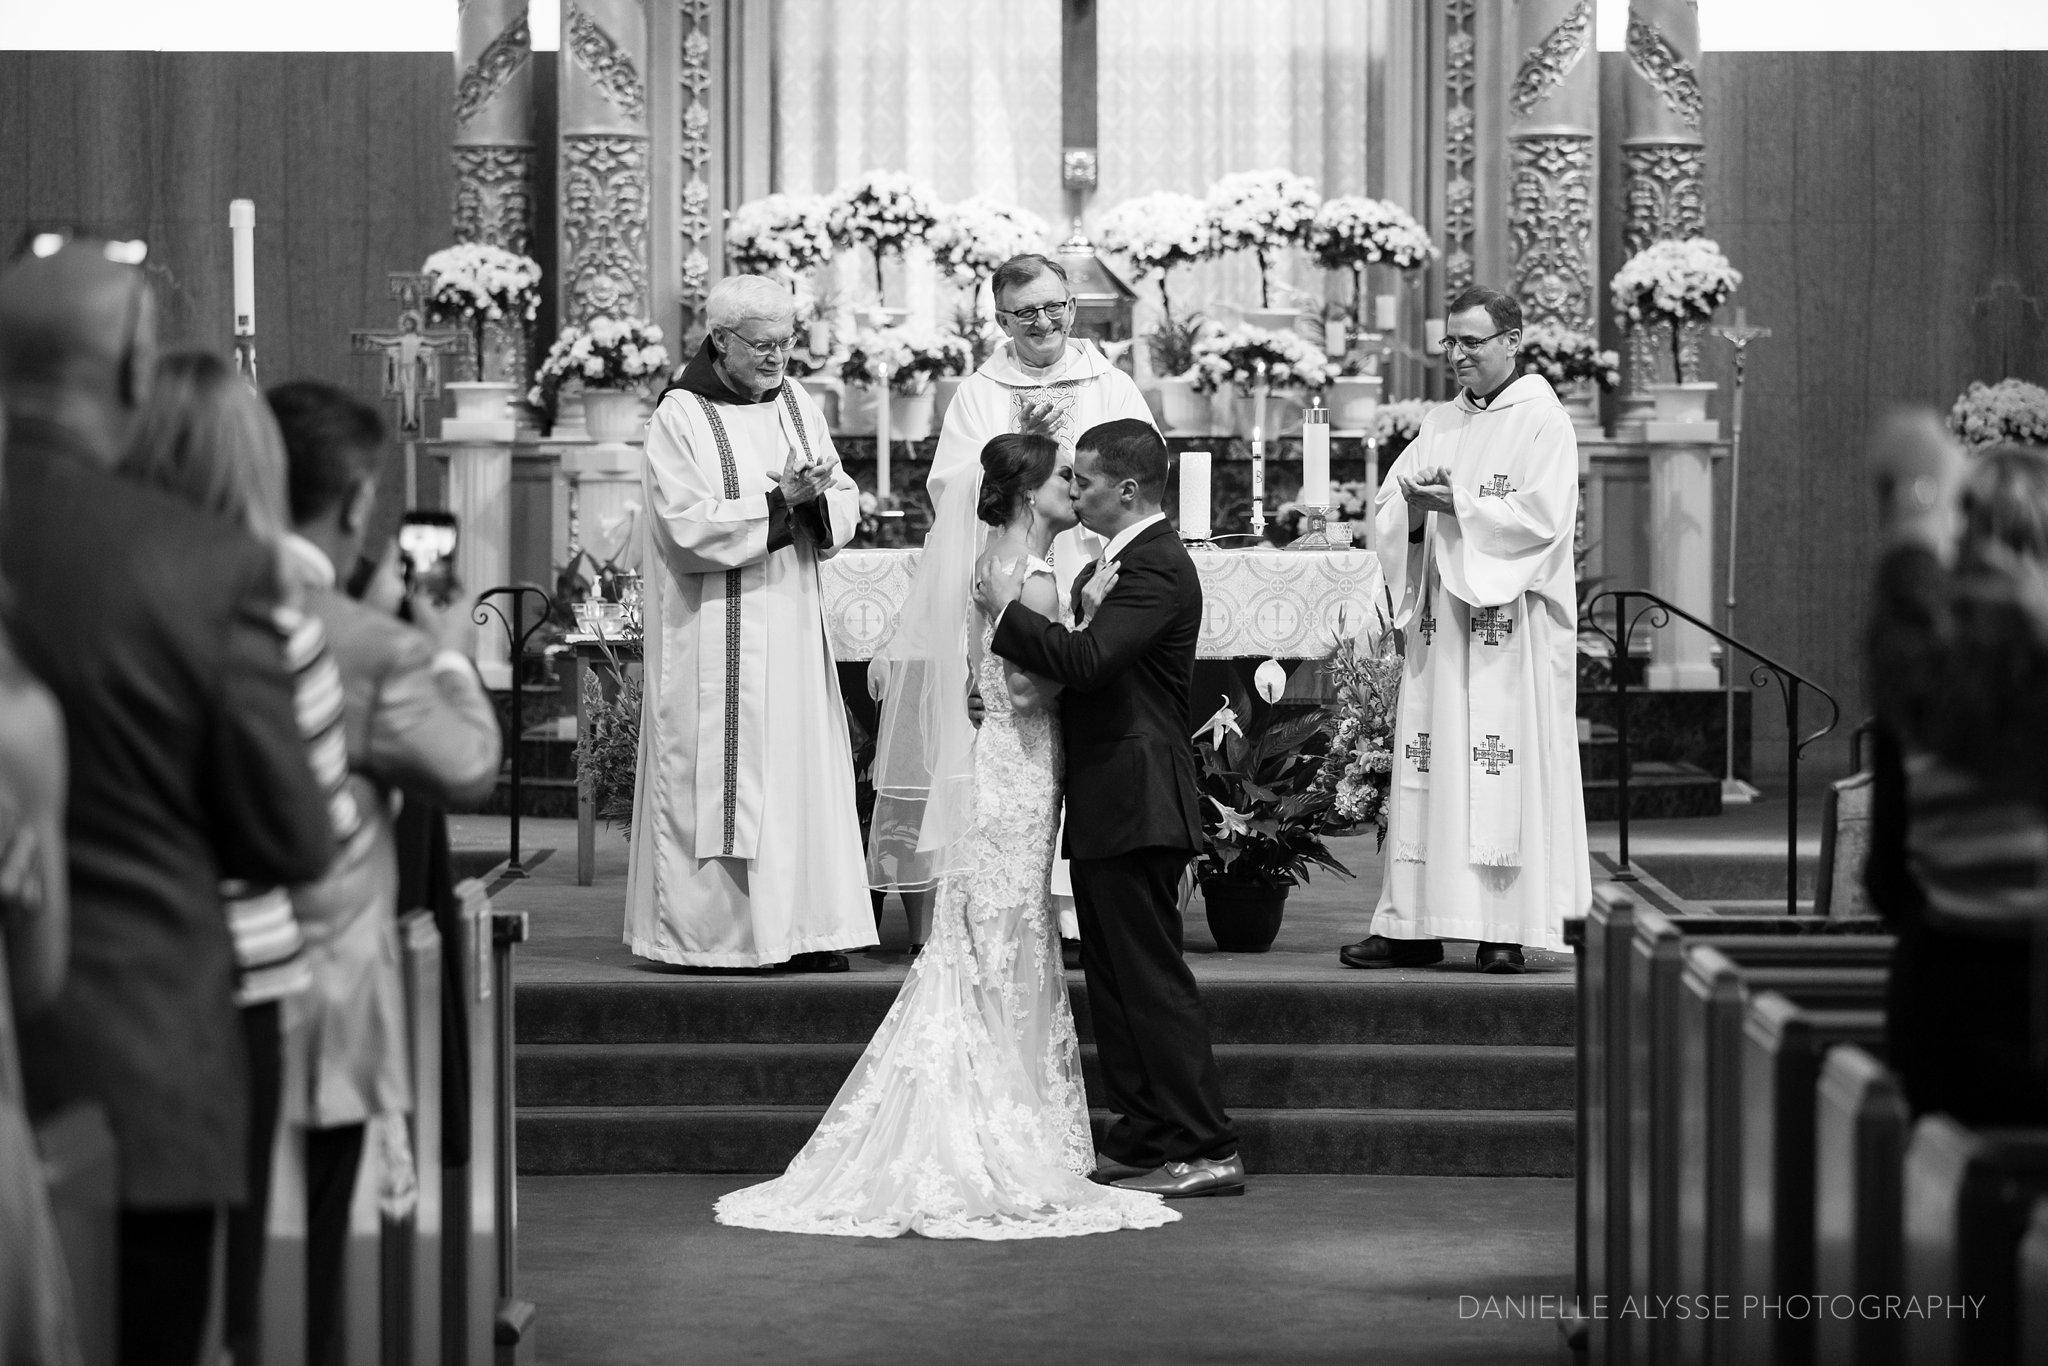 170429_blog_kimberly_ben_wedding_san_mateo_curiodyssey_danielle_alysse_photography_sacramento_photographer0624_WEB.jpg